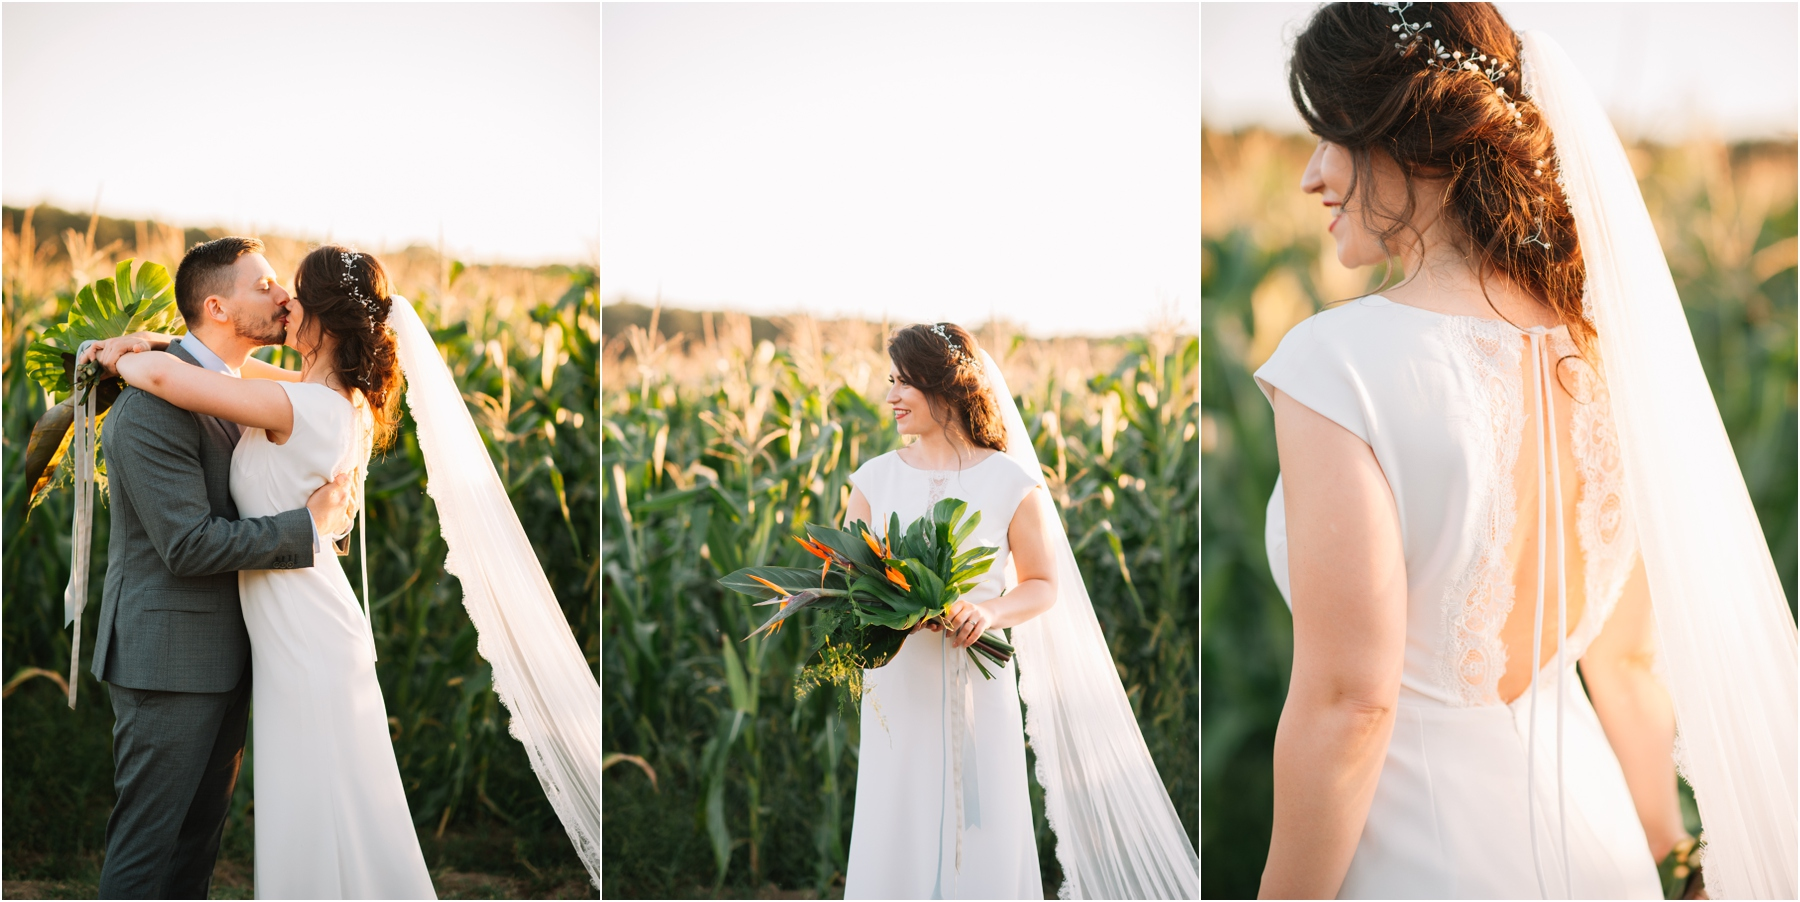 wedding deersphotography0040